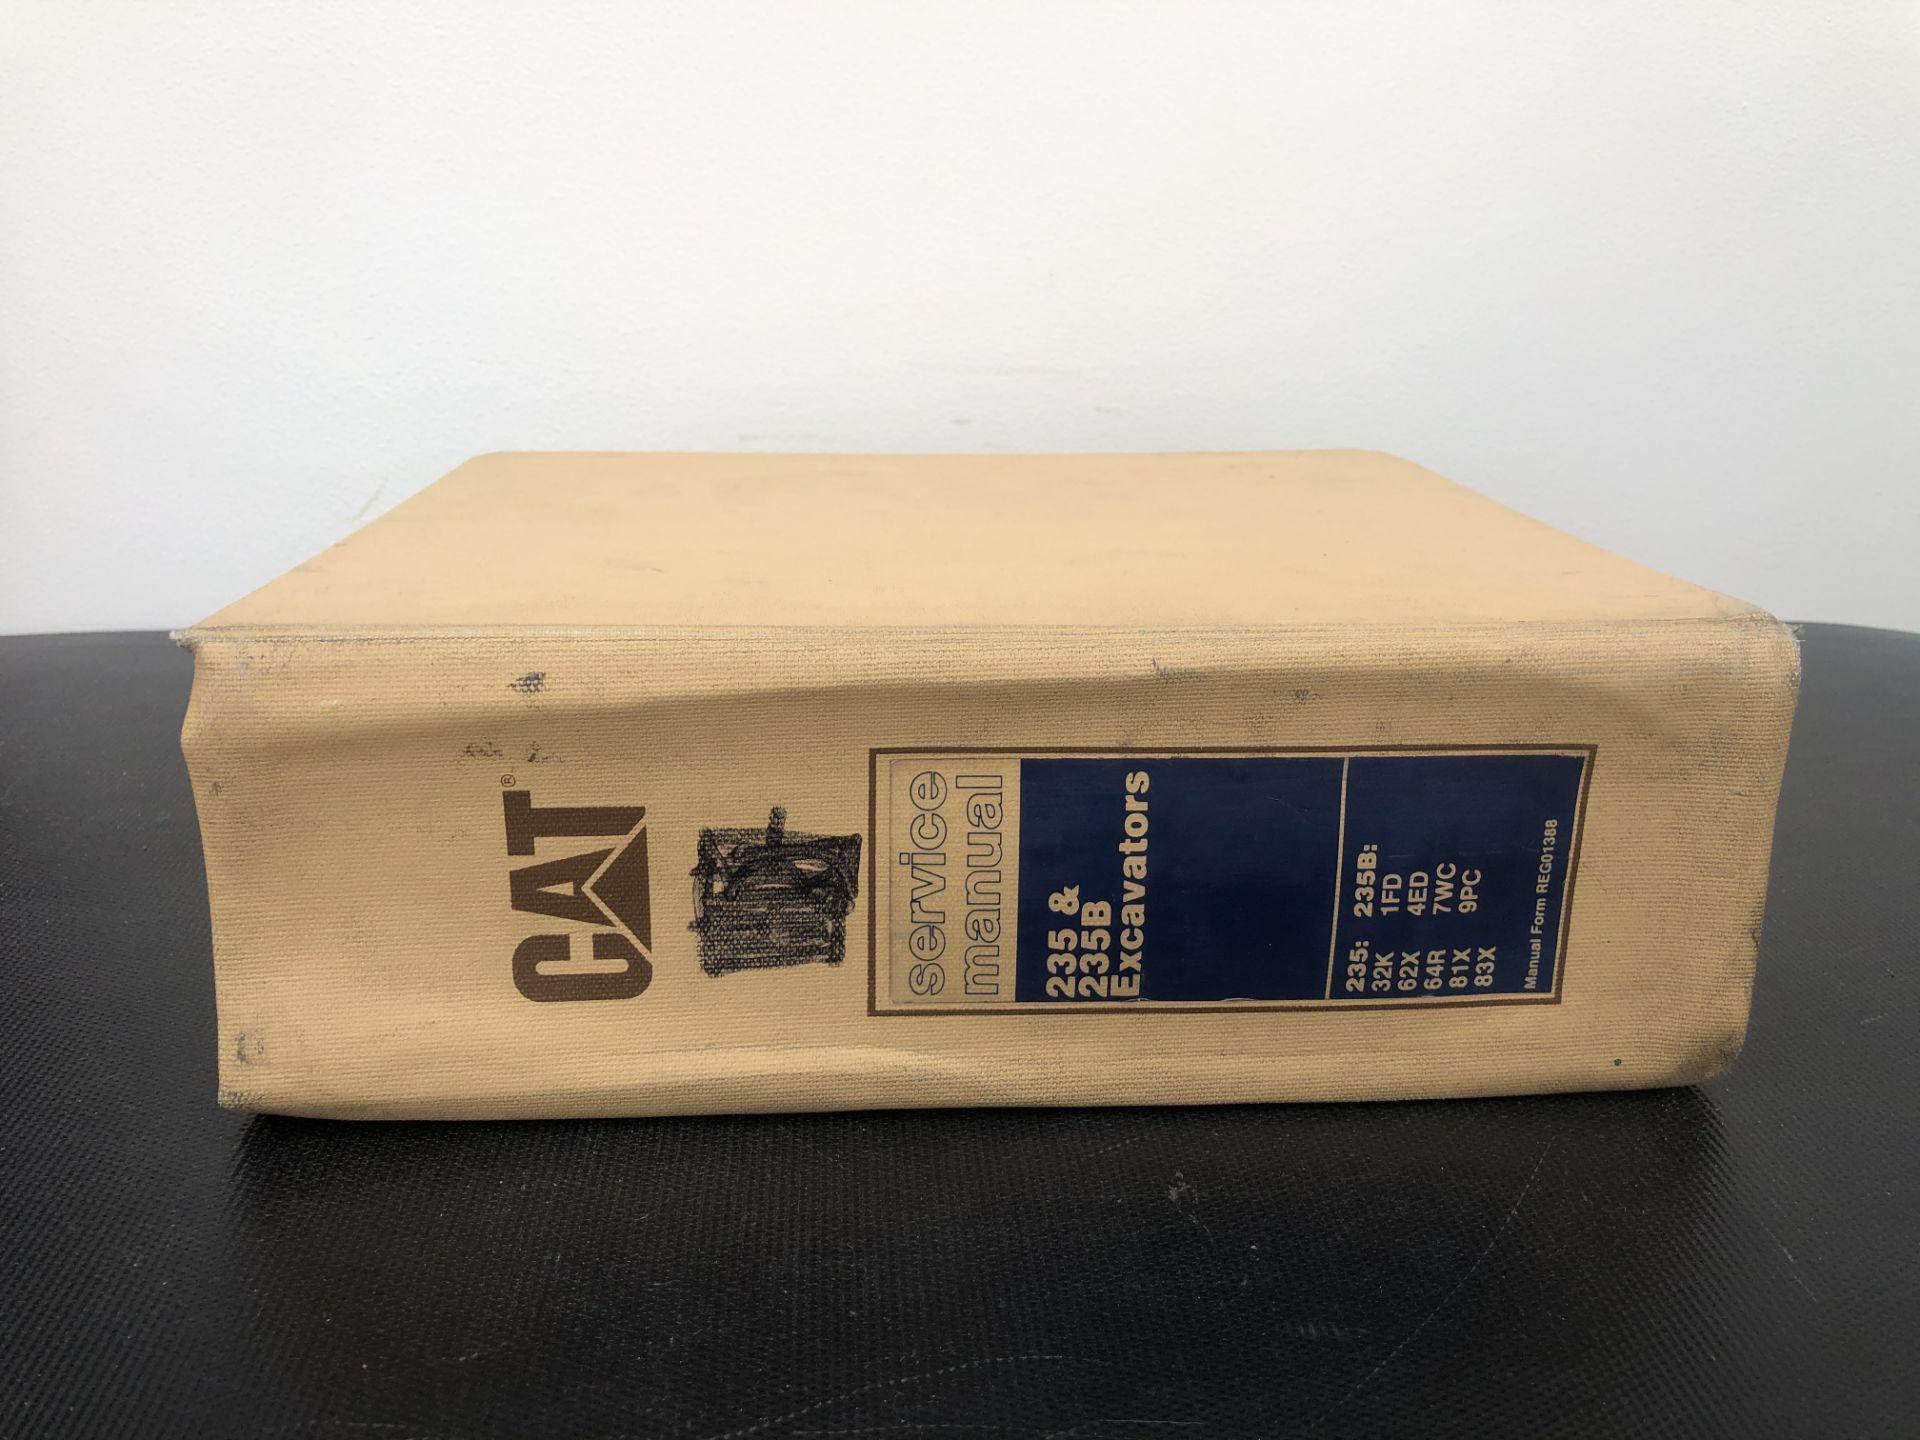 CATERPILLAR 235 235B BOOK 2 SERVICE MANUAL, GENUINE FACTORY CAT WORKSHOP MANUAL